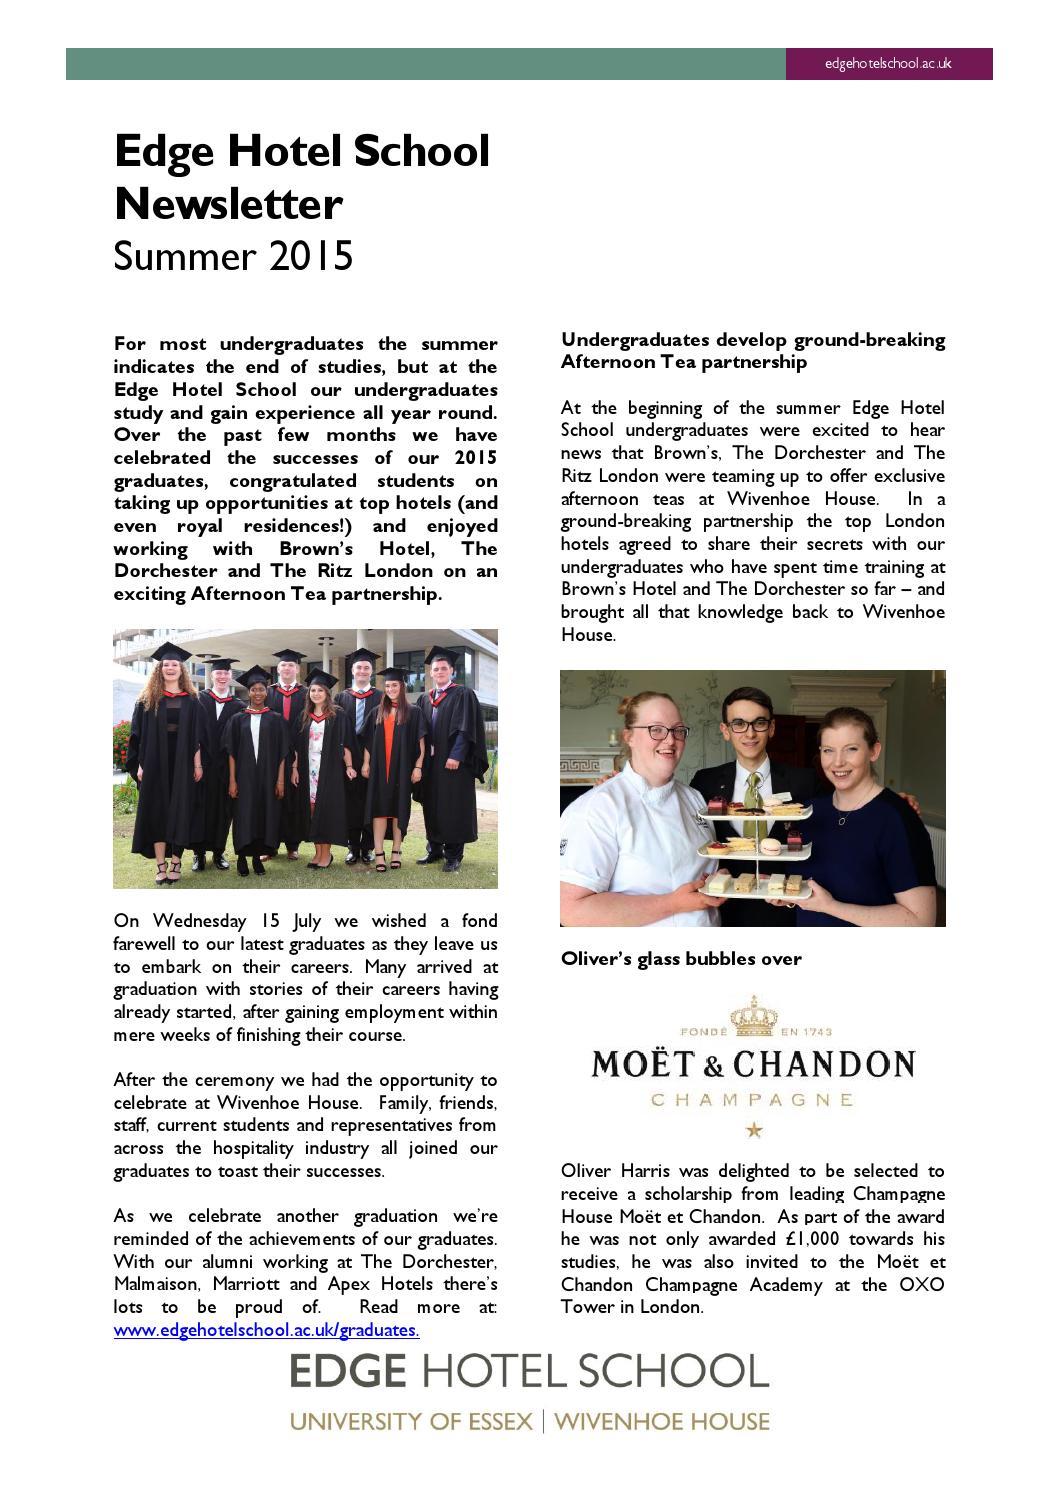 Edge hotel school summer newsletter 2015 by edge hotel school issuu sciox Choice Image